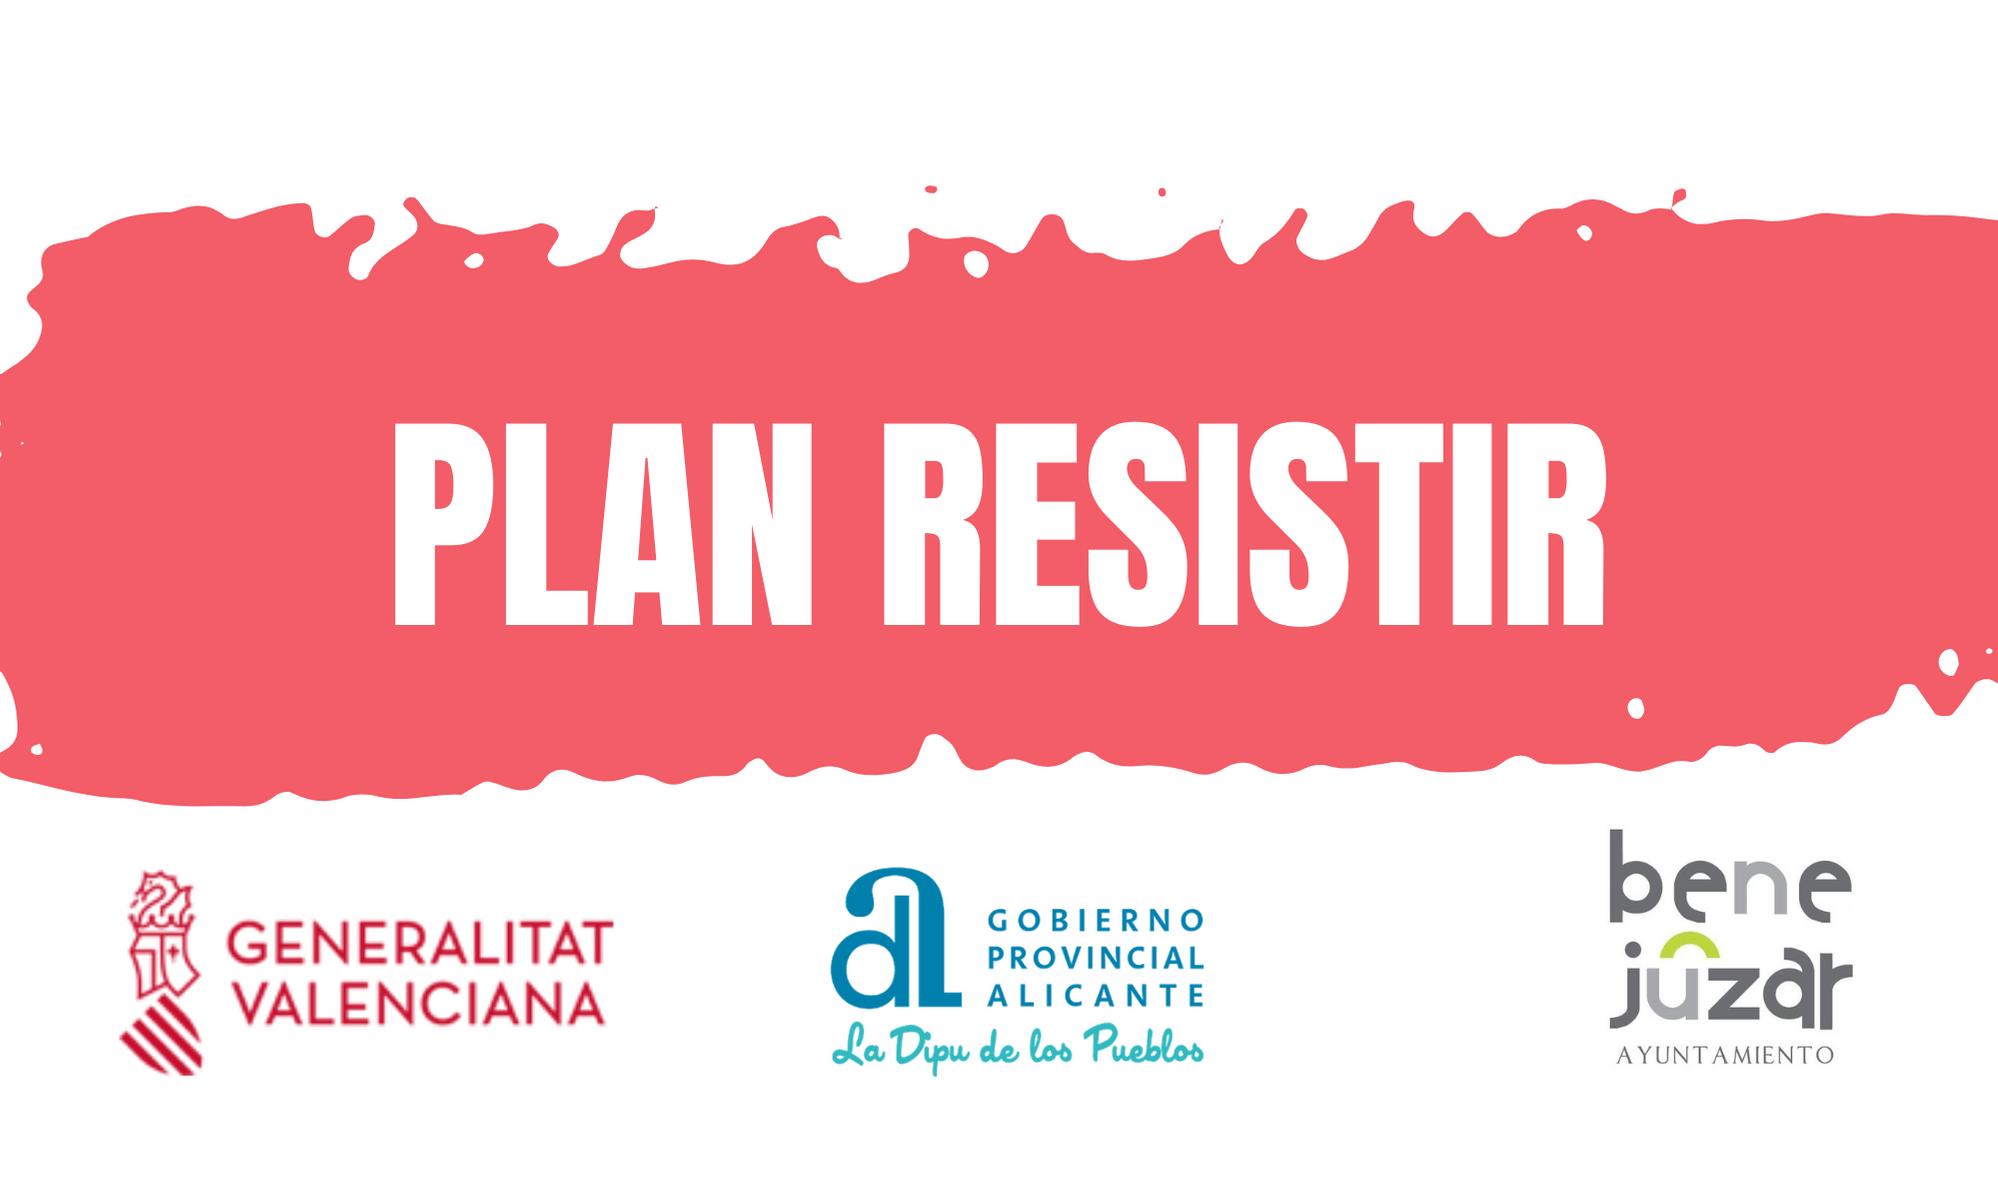 PLAN RESISTIR